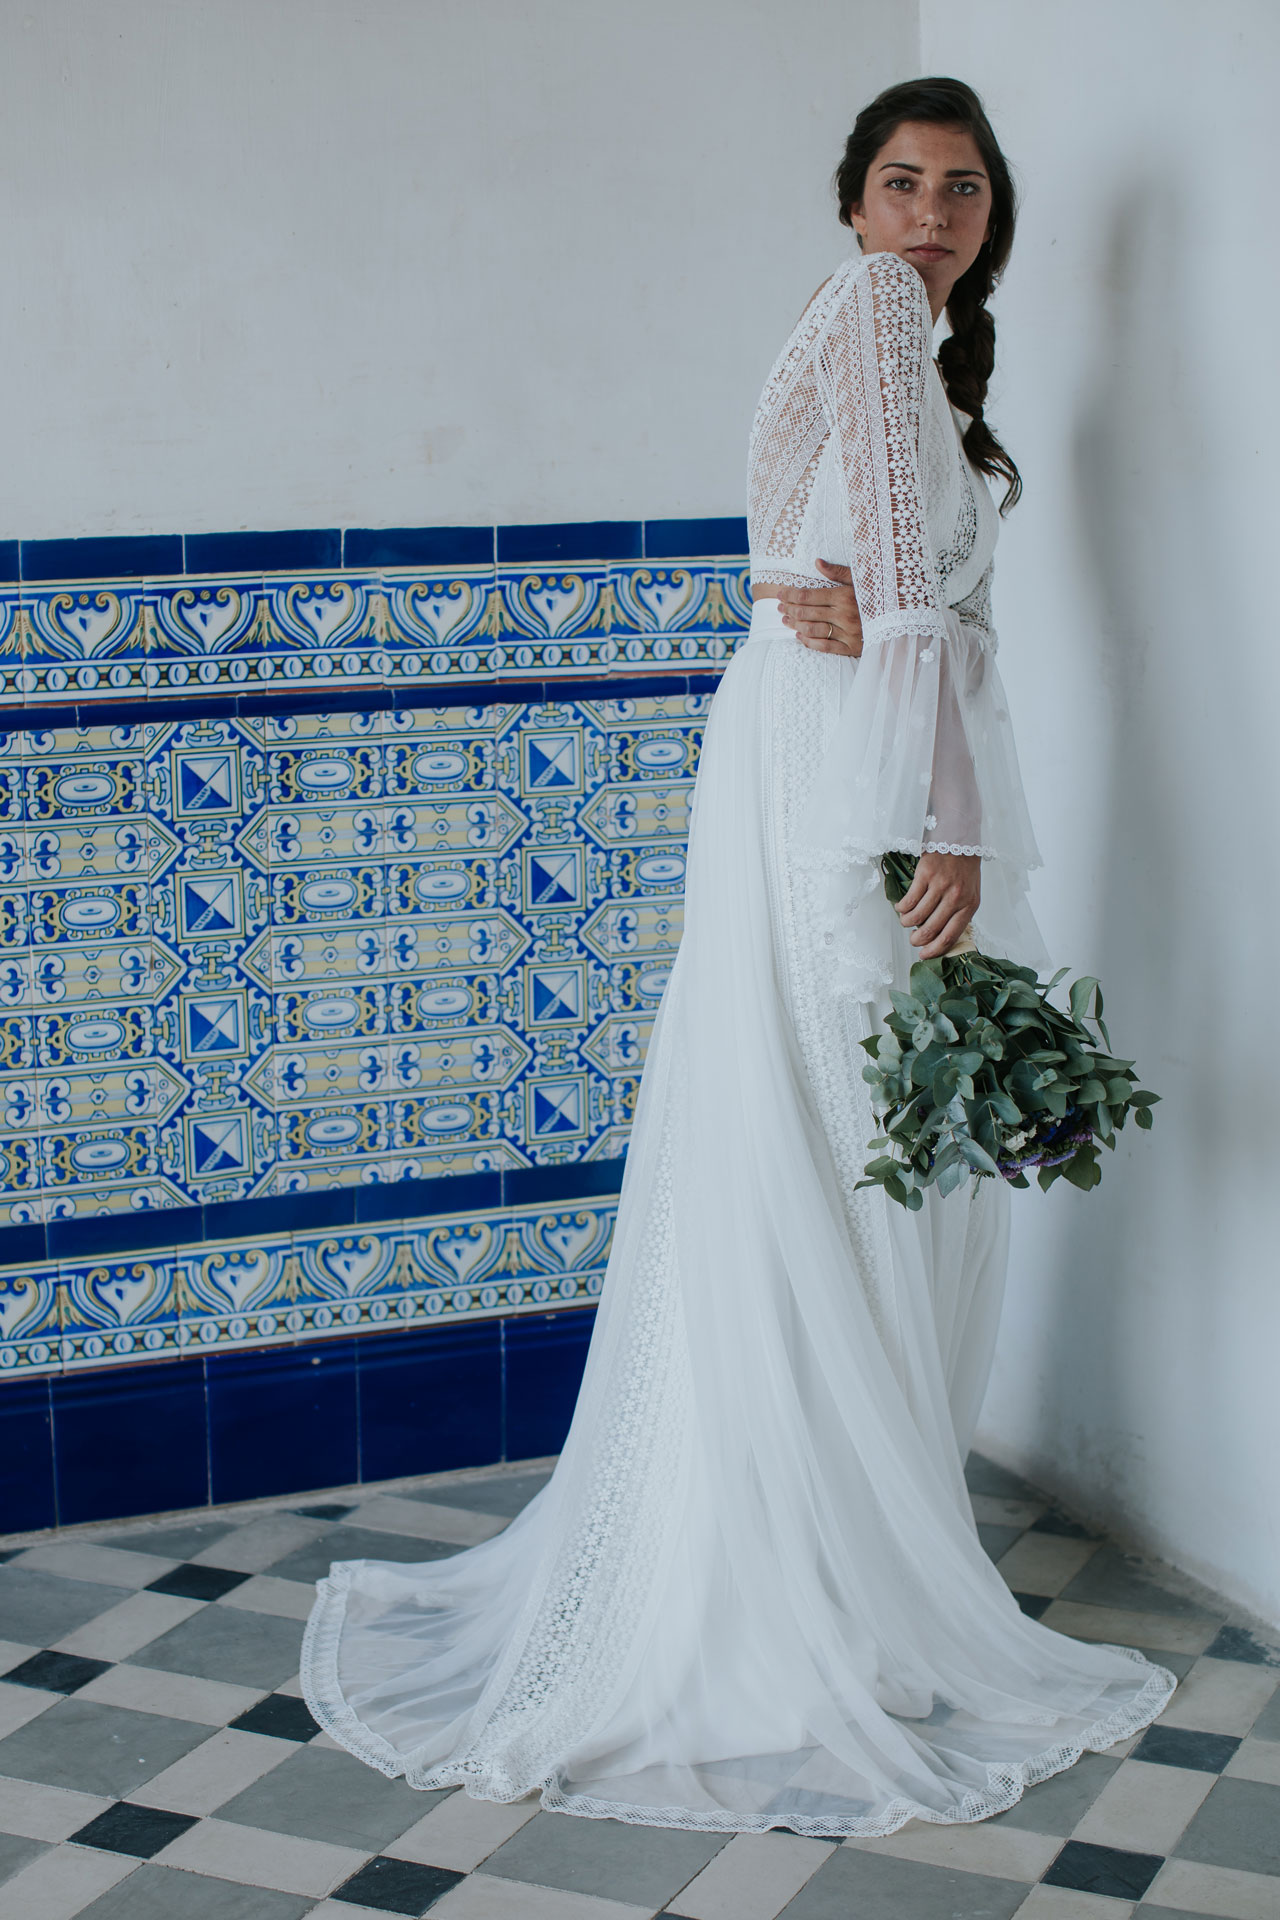 Vestido de novia Yolanda / L'AVETIS